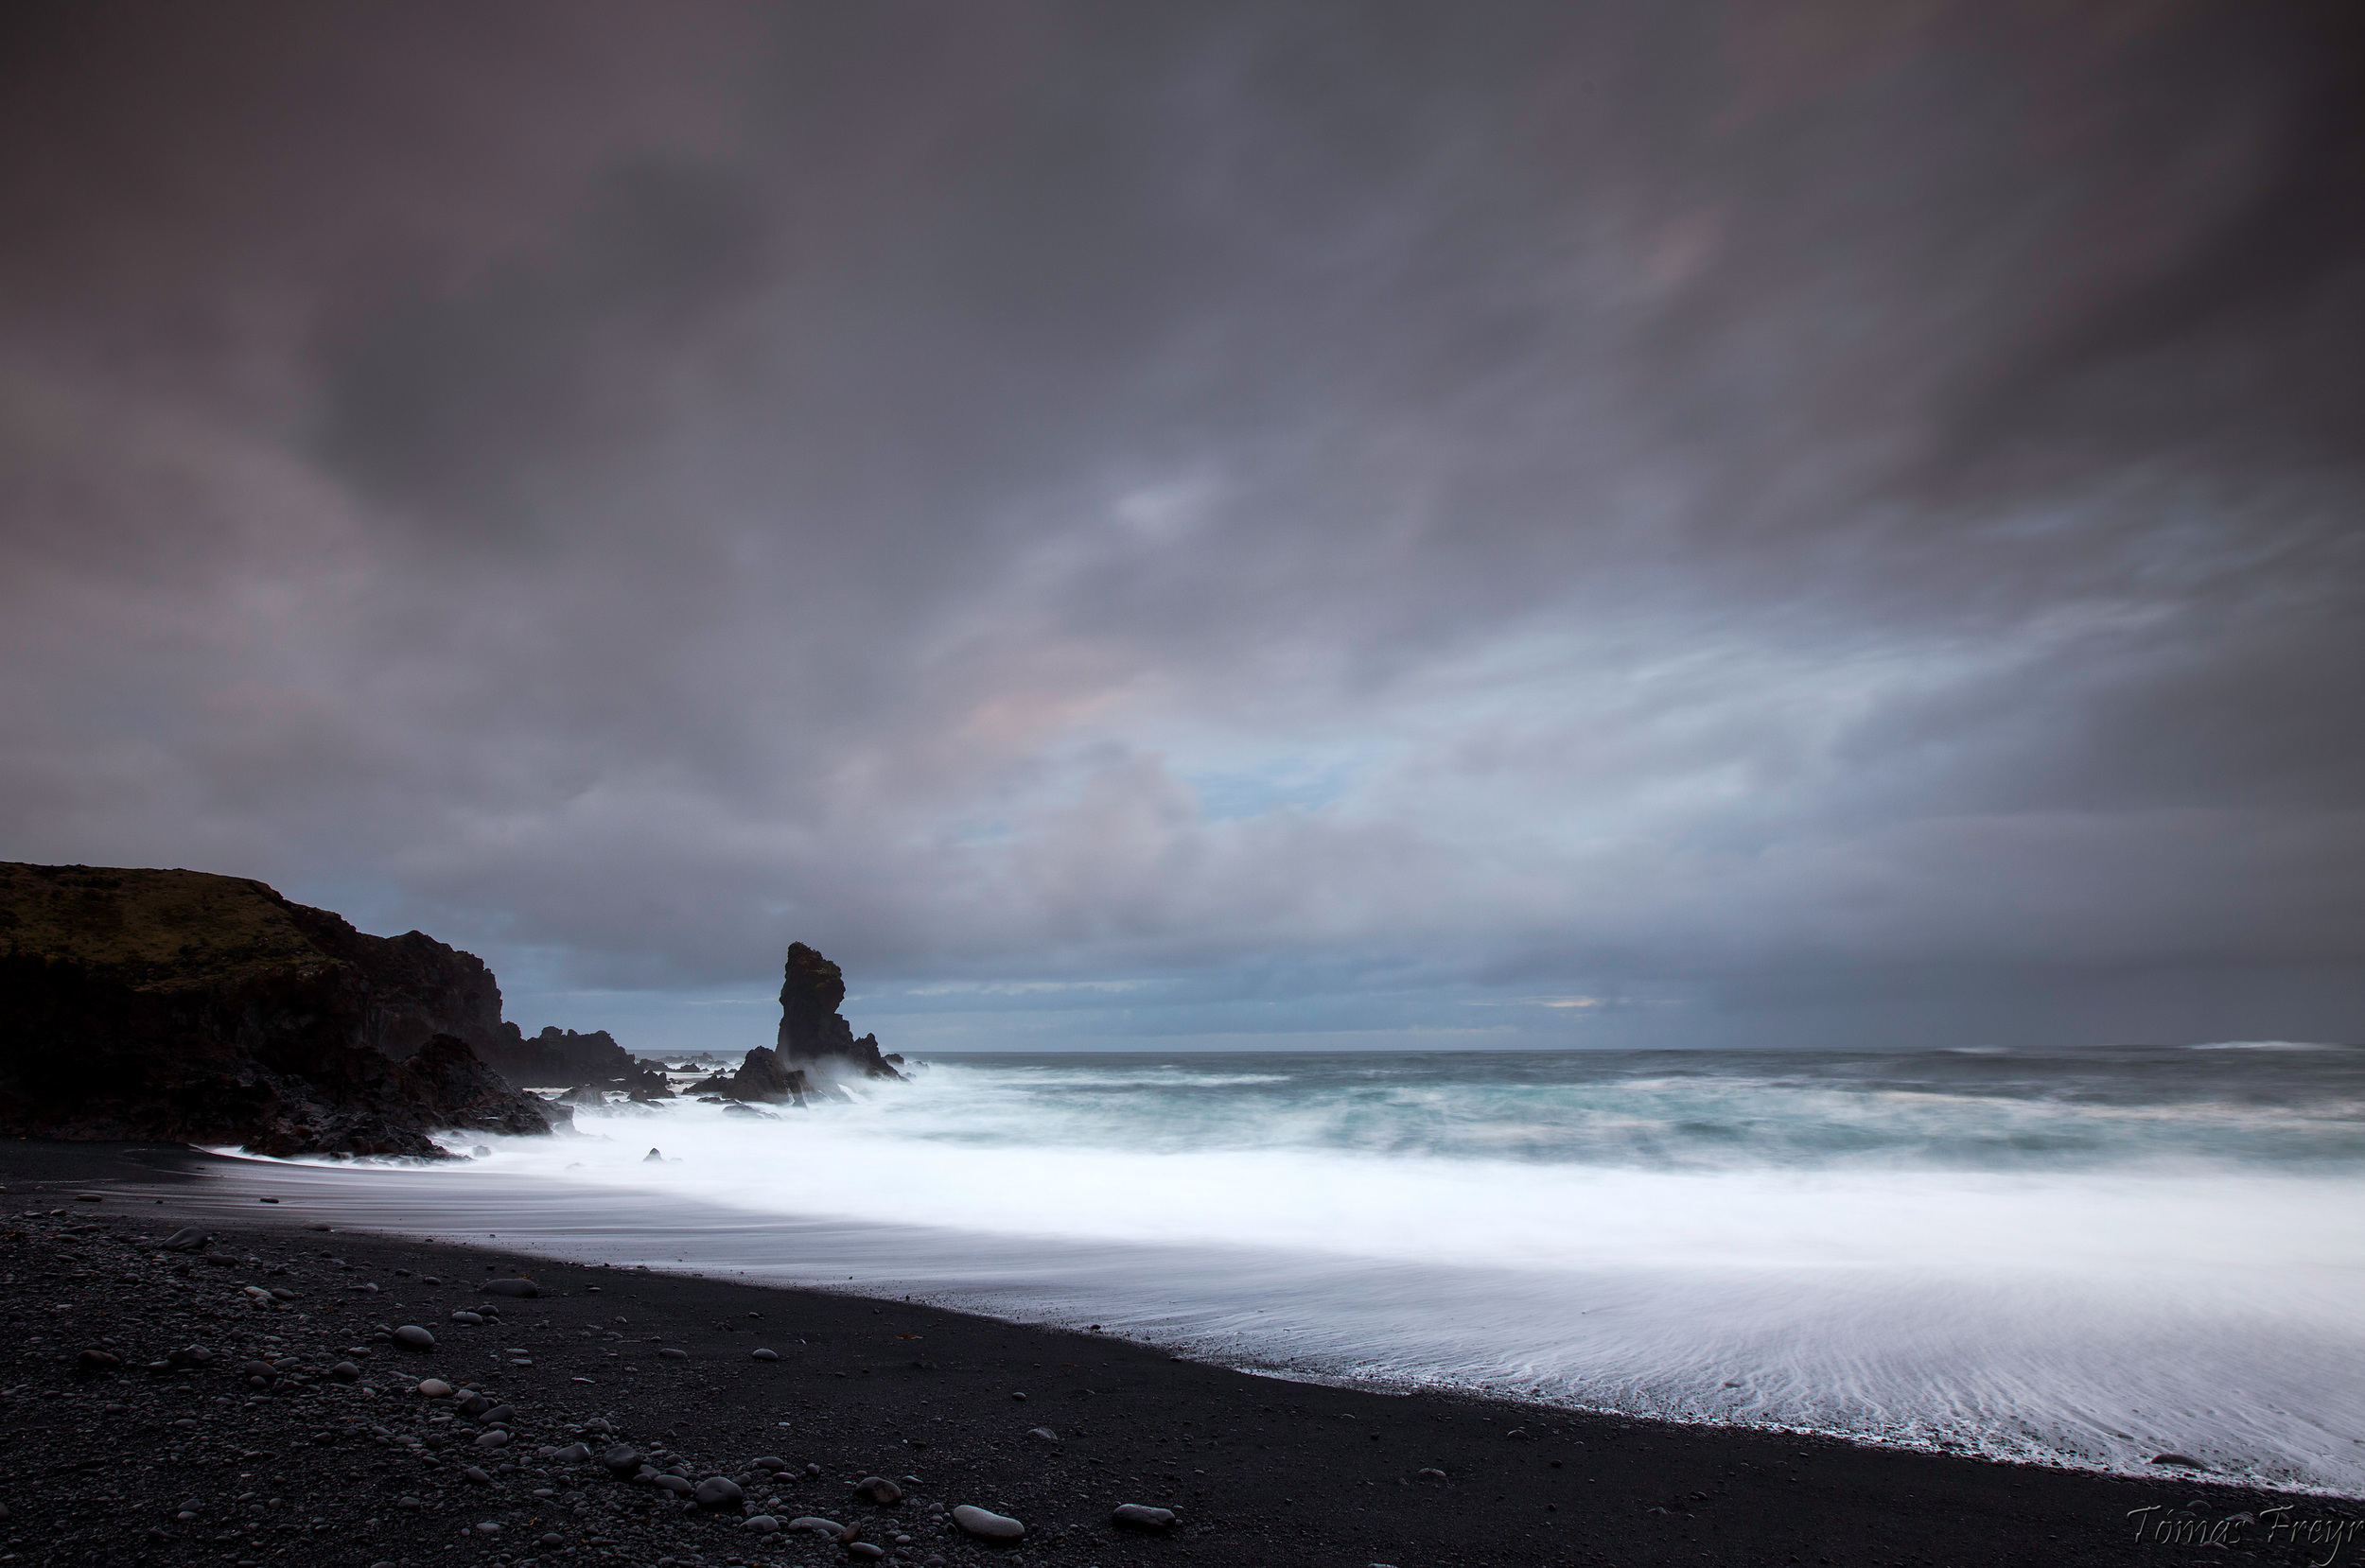 Djúpalónssandur black pebble beach in Snæfelljökull national park